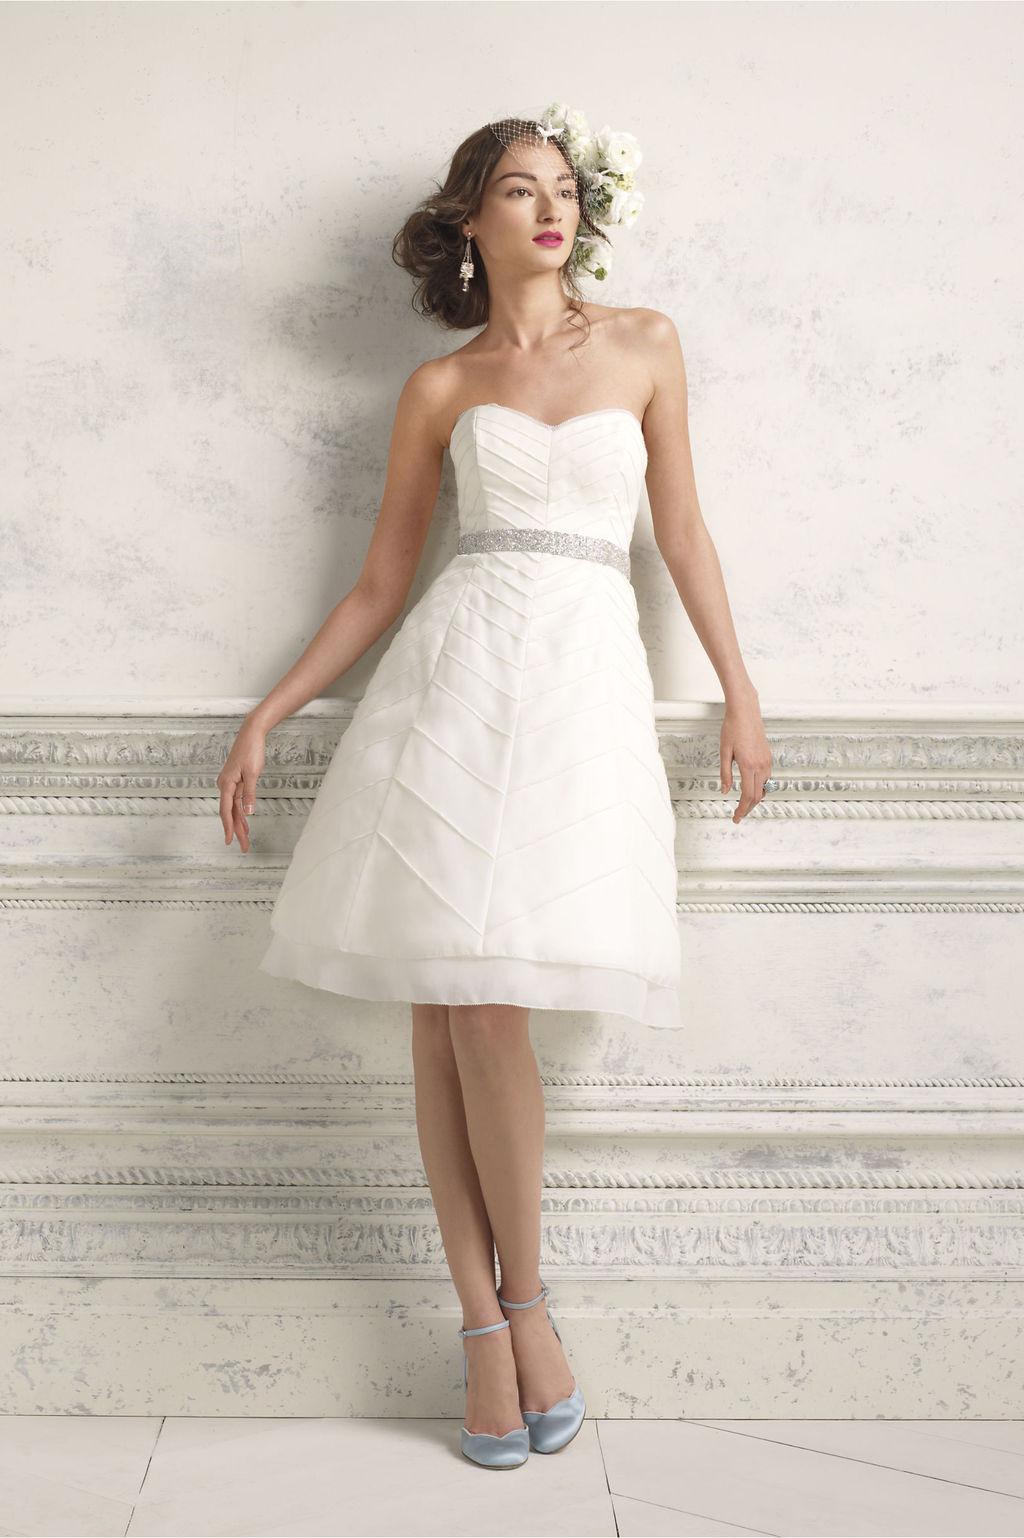 Bridal-belts-chic-wedding-accessories-bhldn-1.full